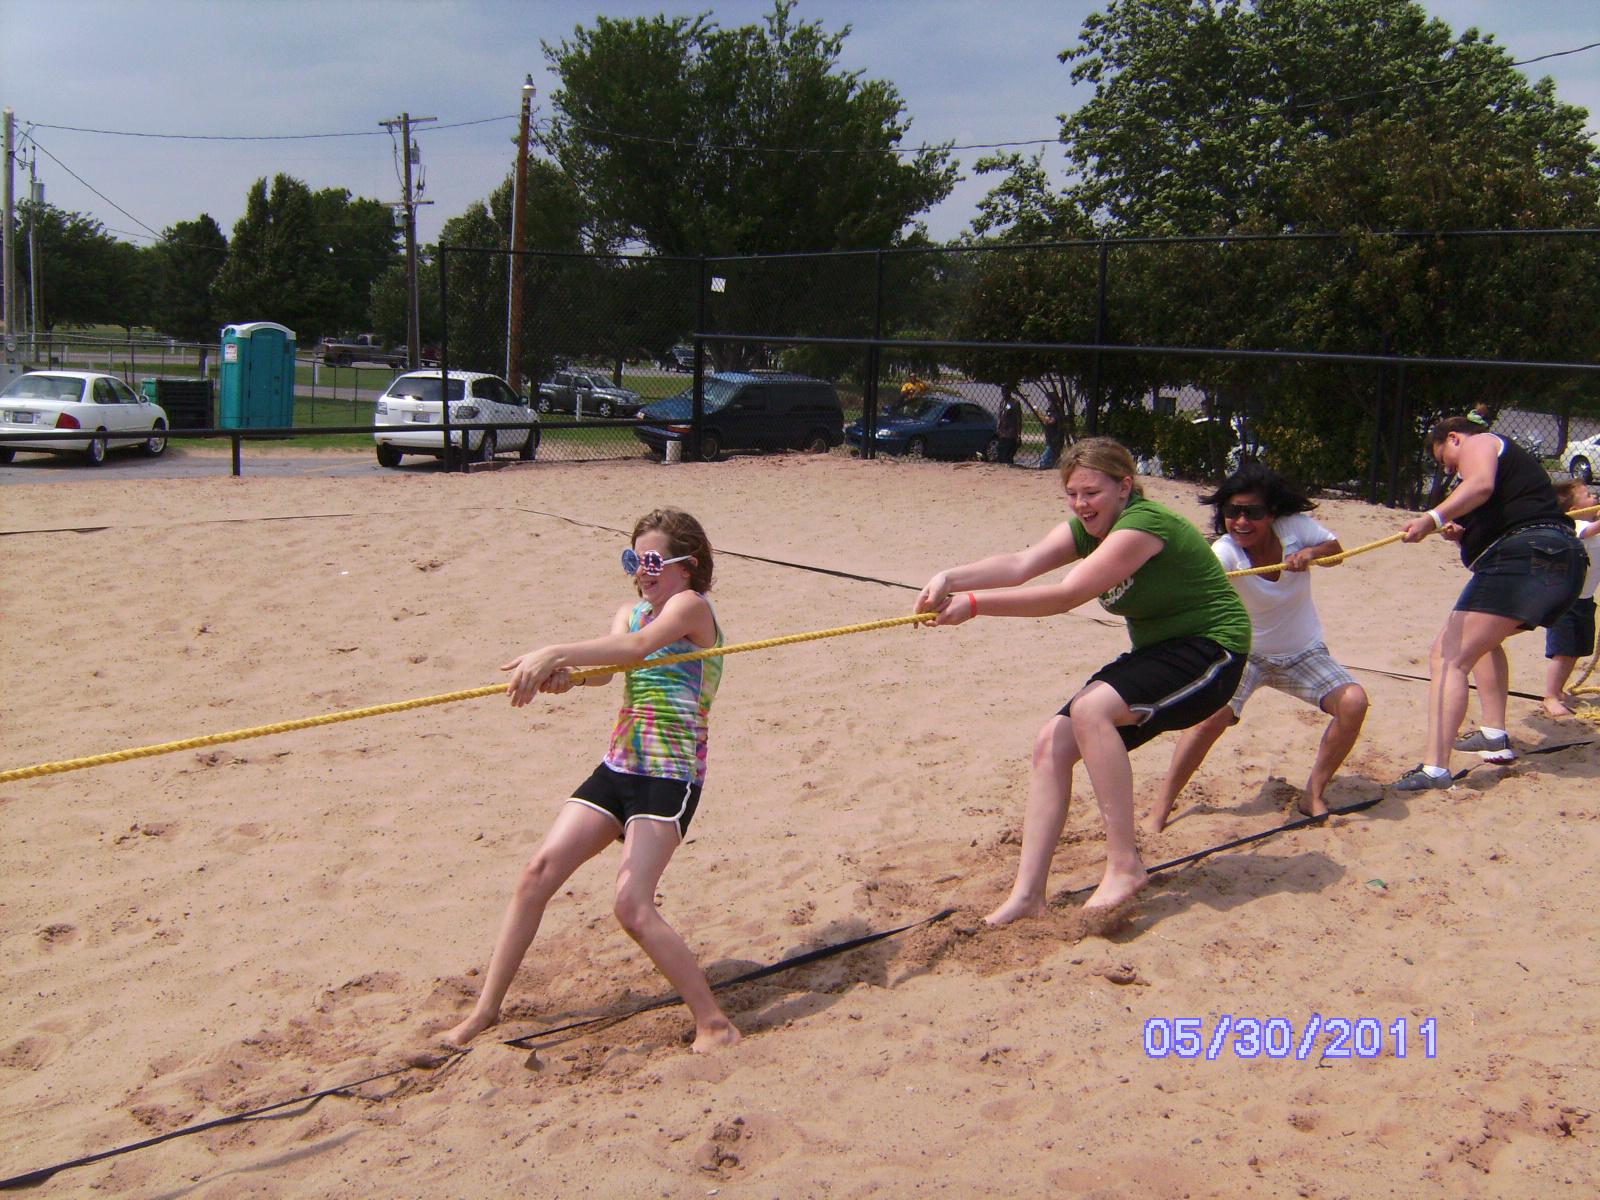 college essays college application essays volleyball essay ideas volleyball mega essays beach volleyball essays